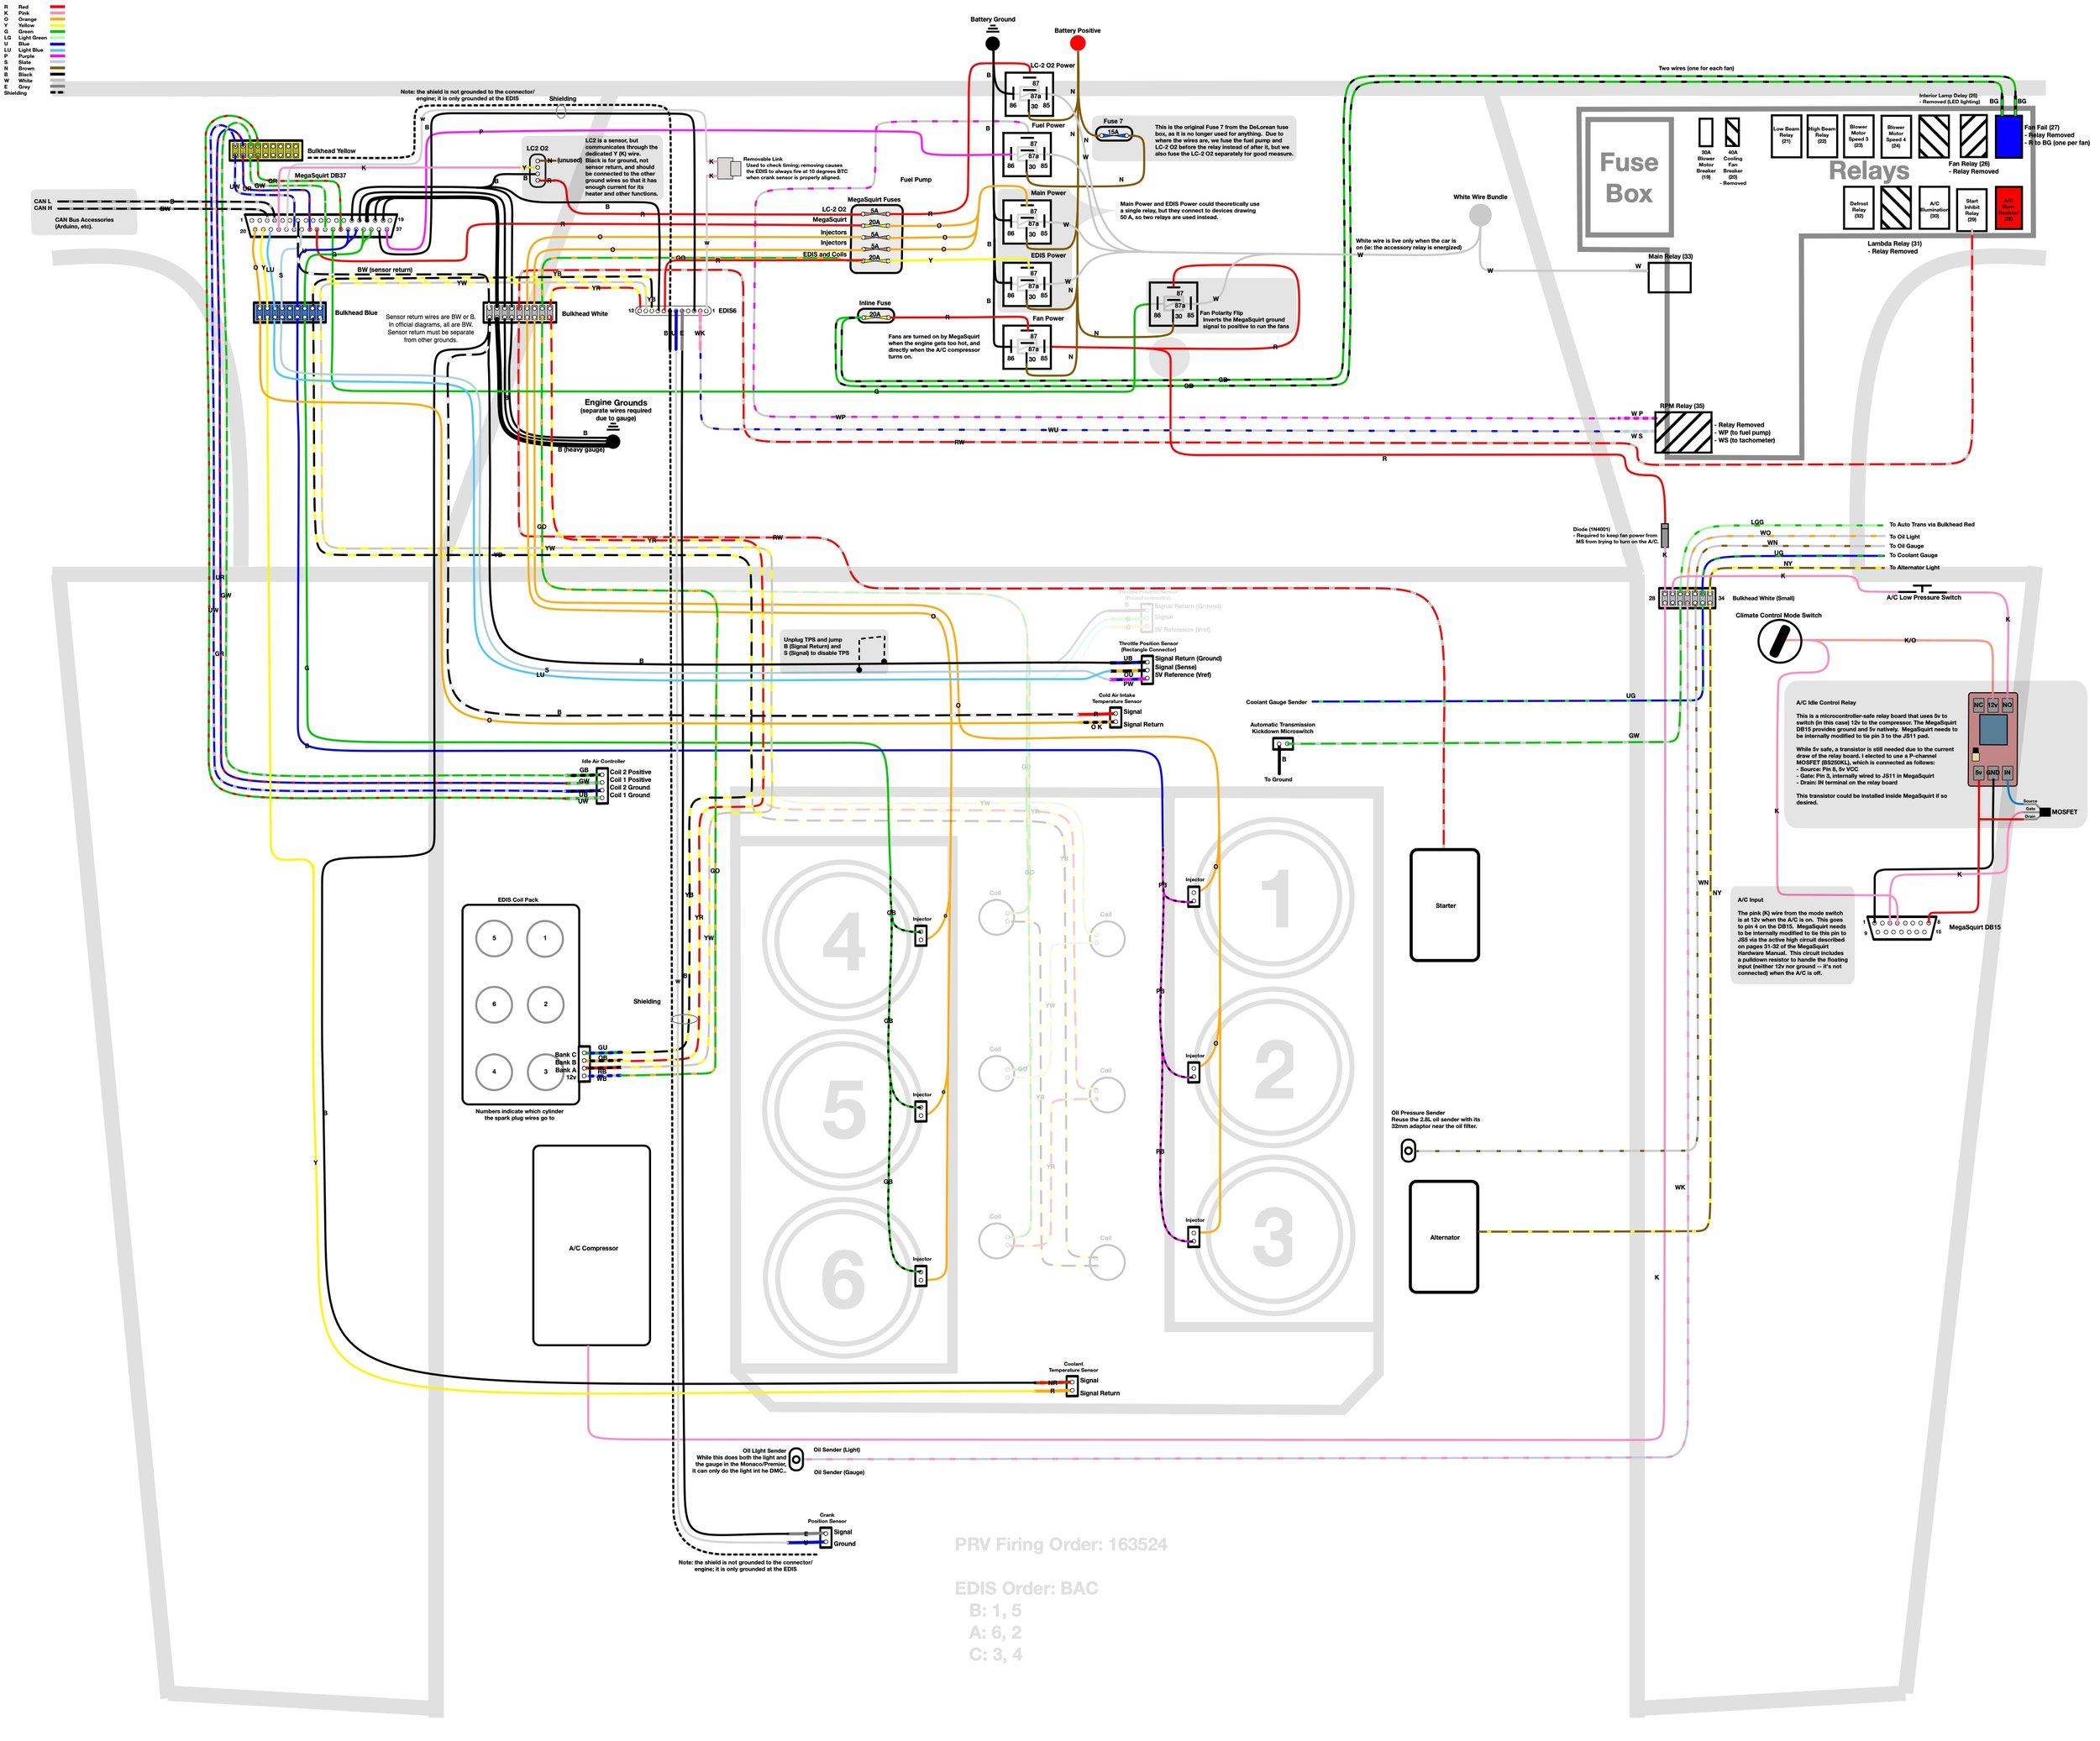 wiring, installing the new harness and fuel injector refurbishing Car Engine Wiring Harness On wiring, installing the new harness and fuel injector refurbishing \u2014 joe\u0027s projects